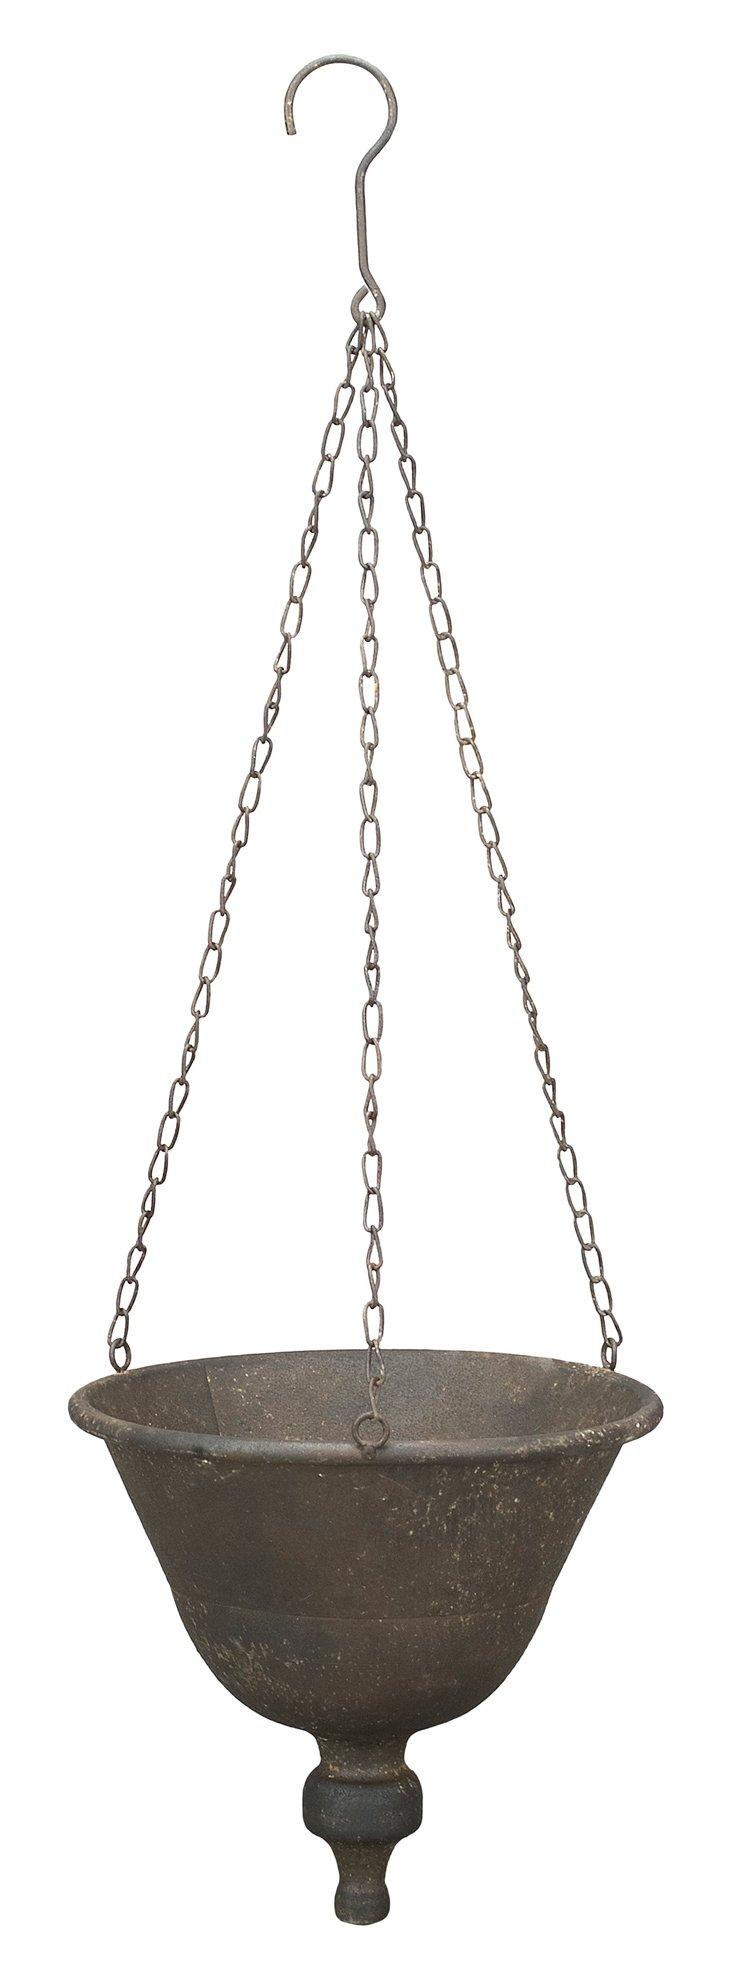 "8"" Hanging Planter, Silver"